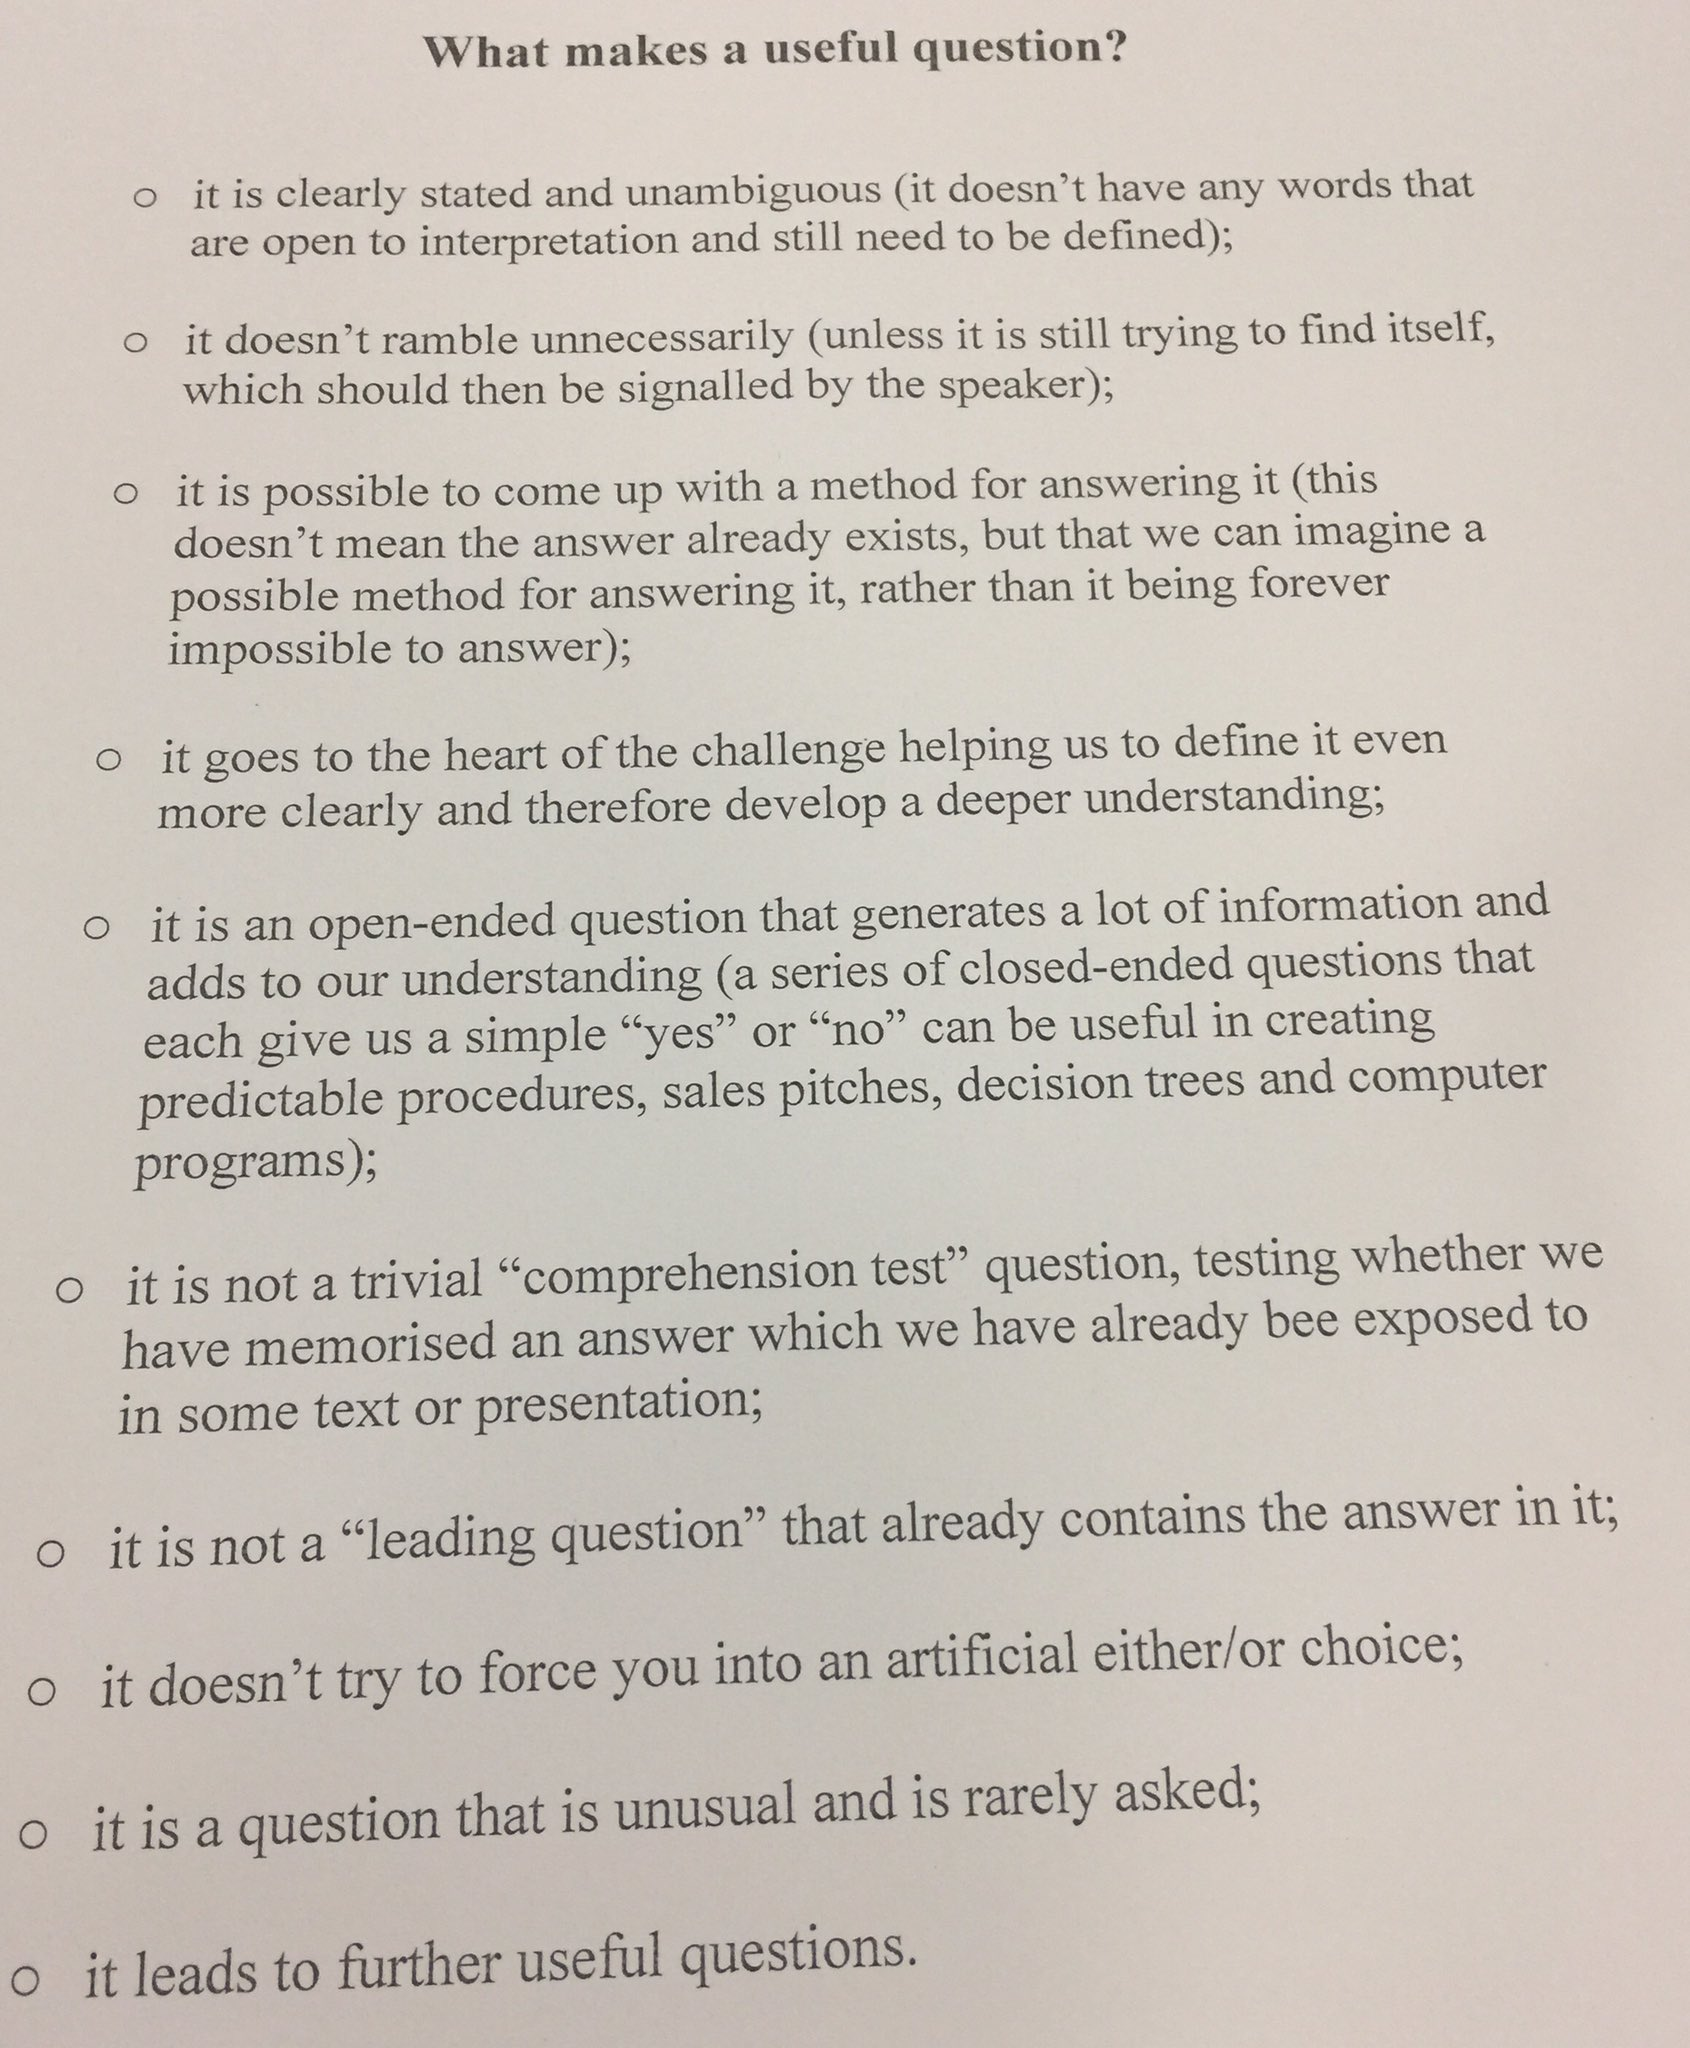 define leading question